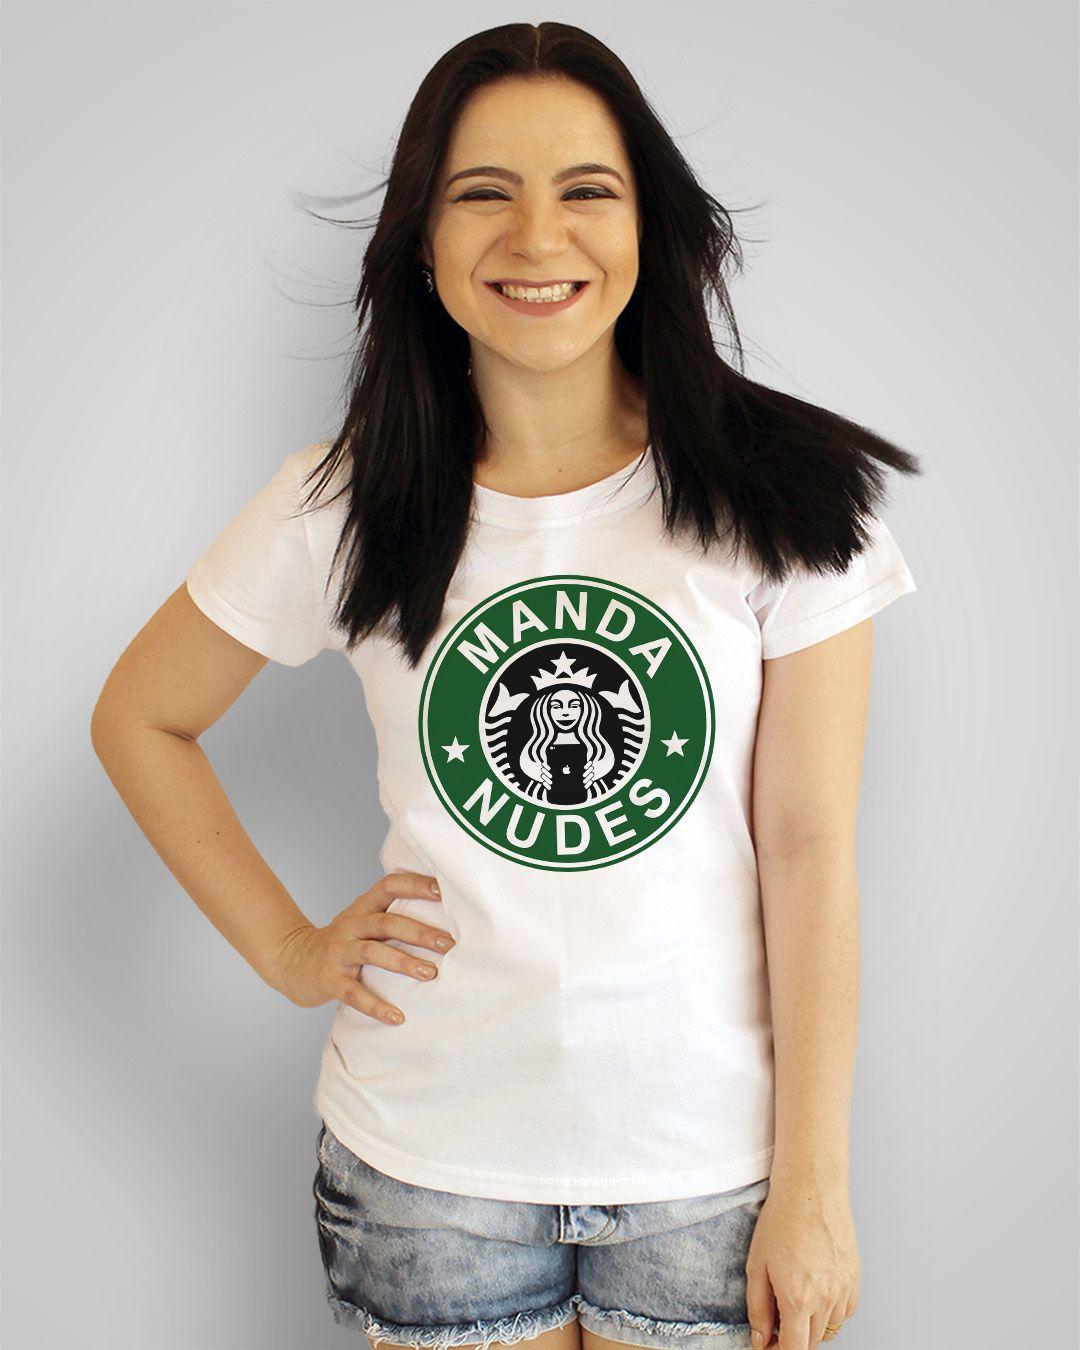 Camiseta Manda nudes - Starbucks